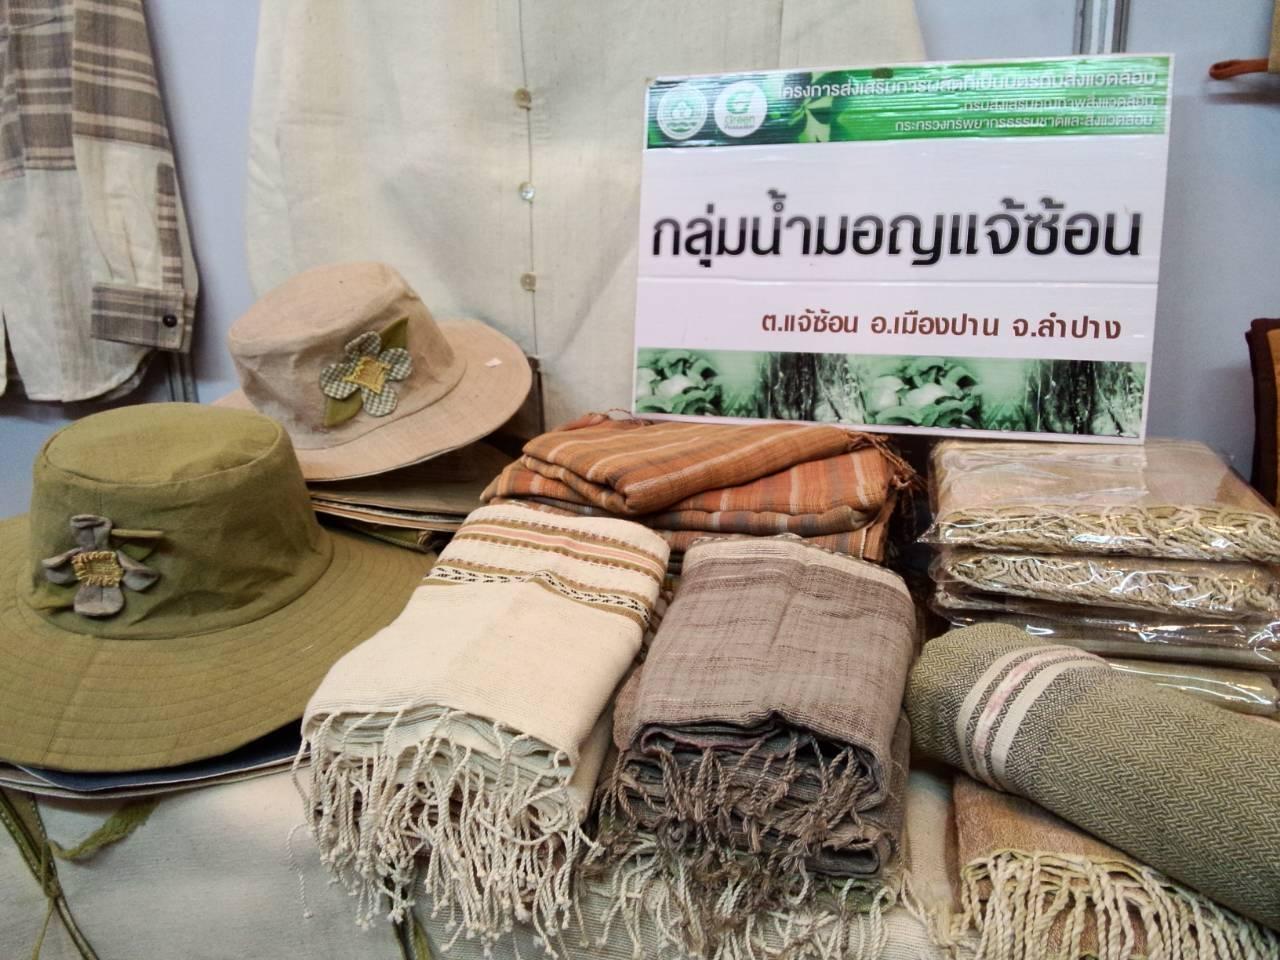 Nammorn Exhibition SCB Otop3 (6)